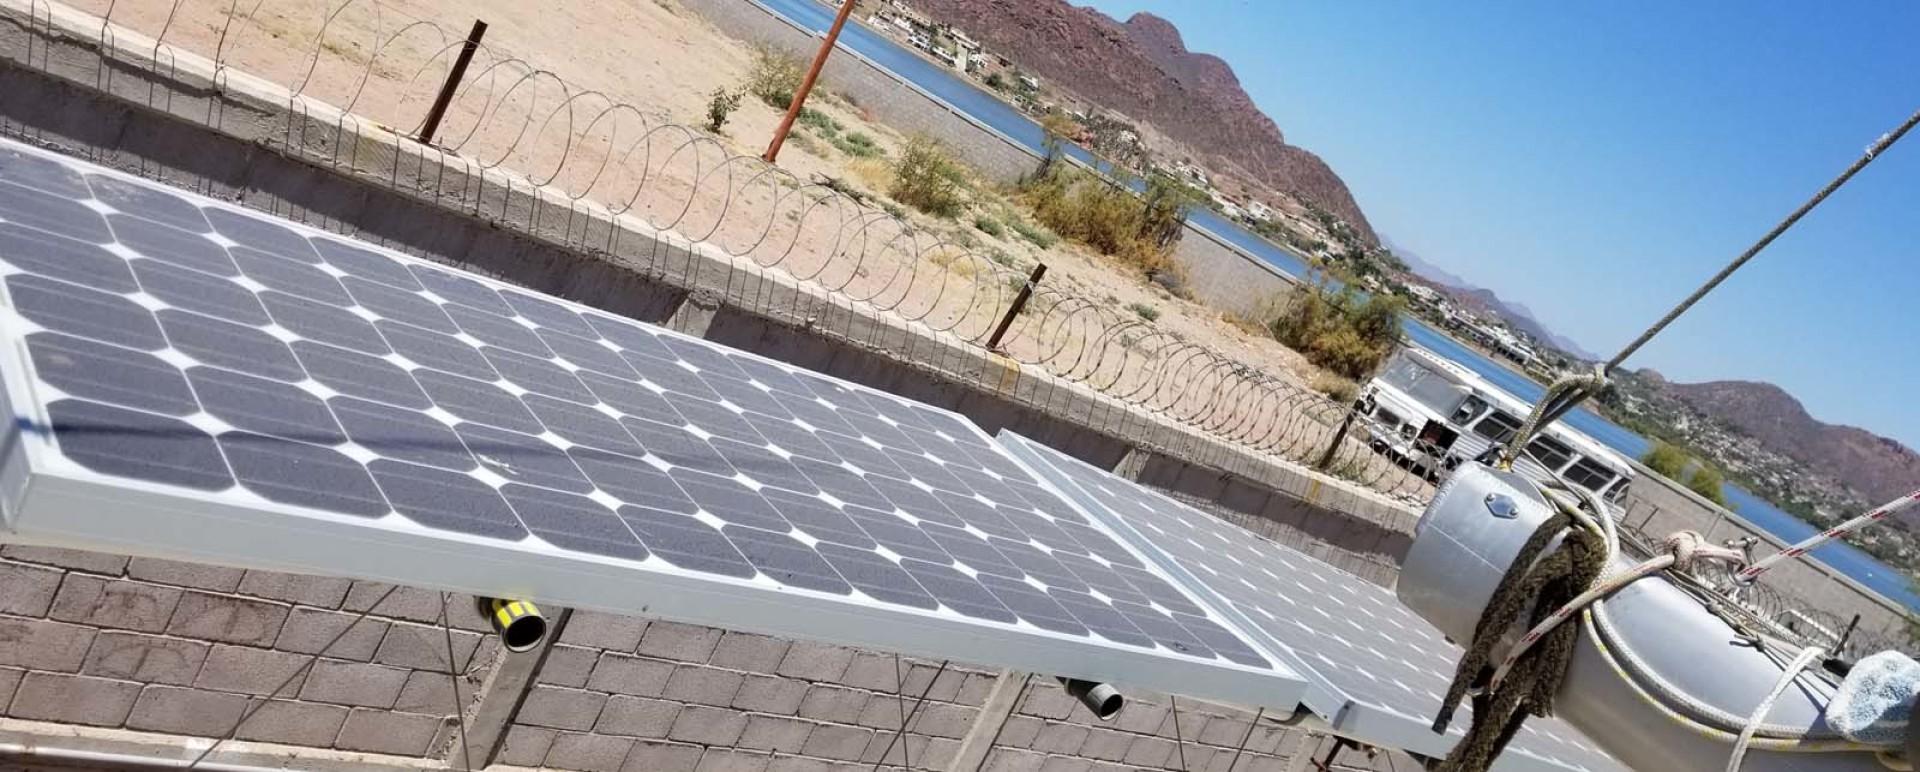 Farrier-44 SC 2014-Mariana Guaymas, SONORA-Mexico-Solar Panel-1159496 | Thumbnail